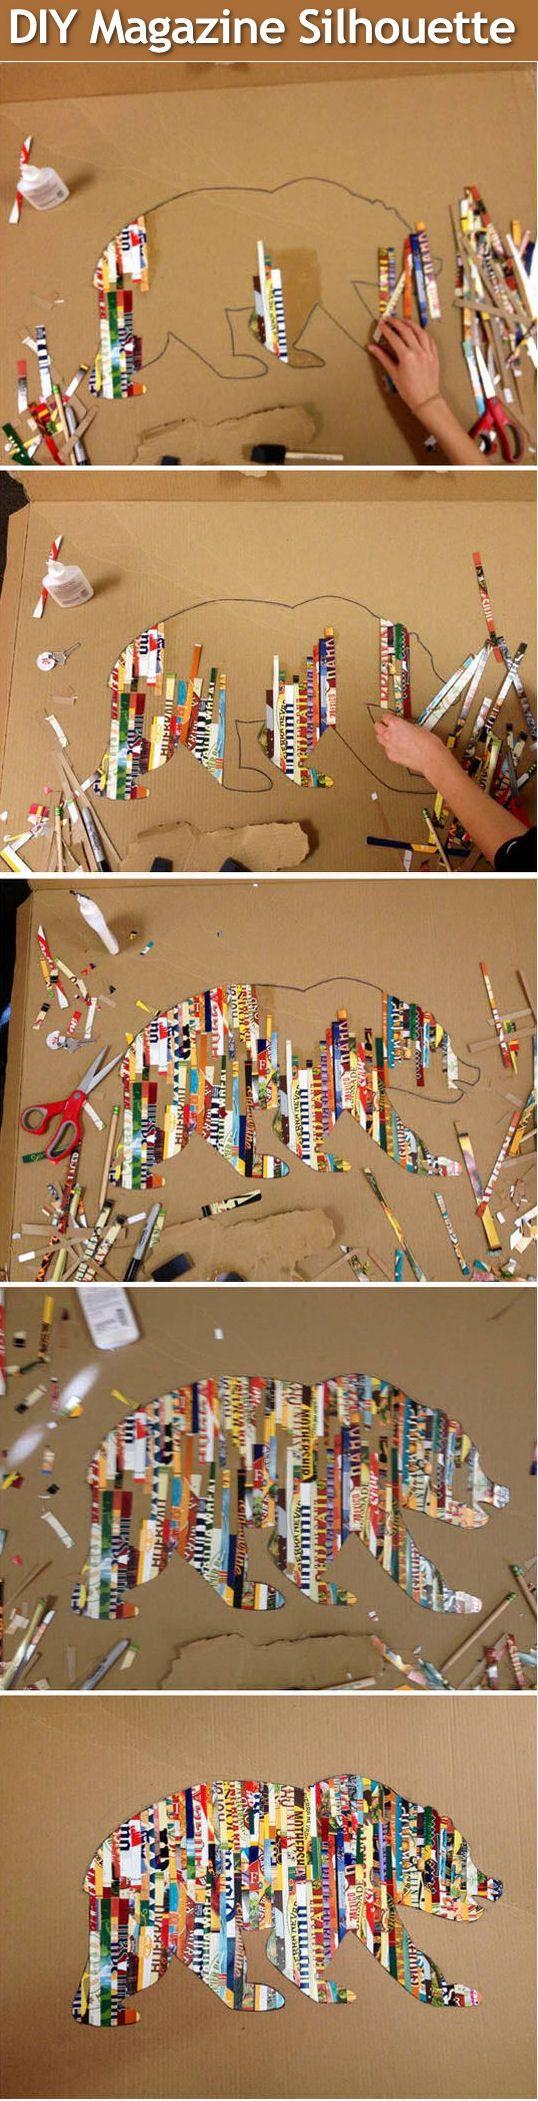 ideias-quarto-crianca-7